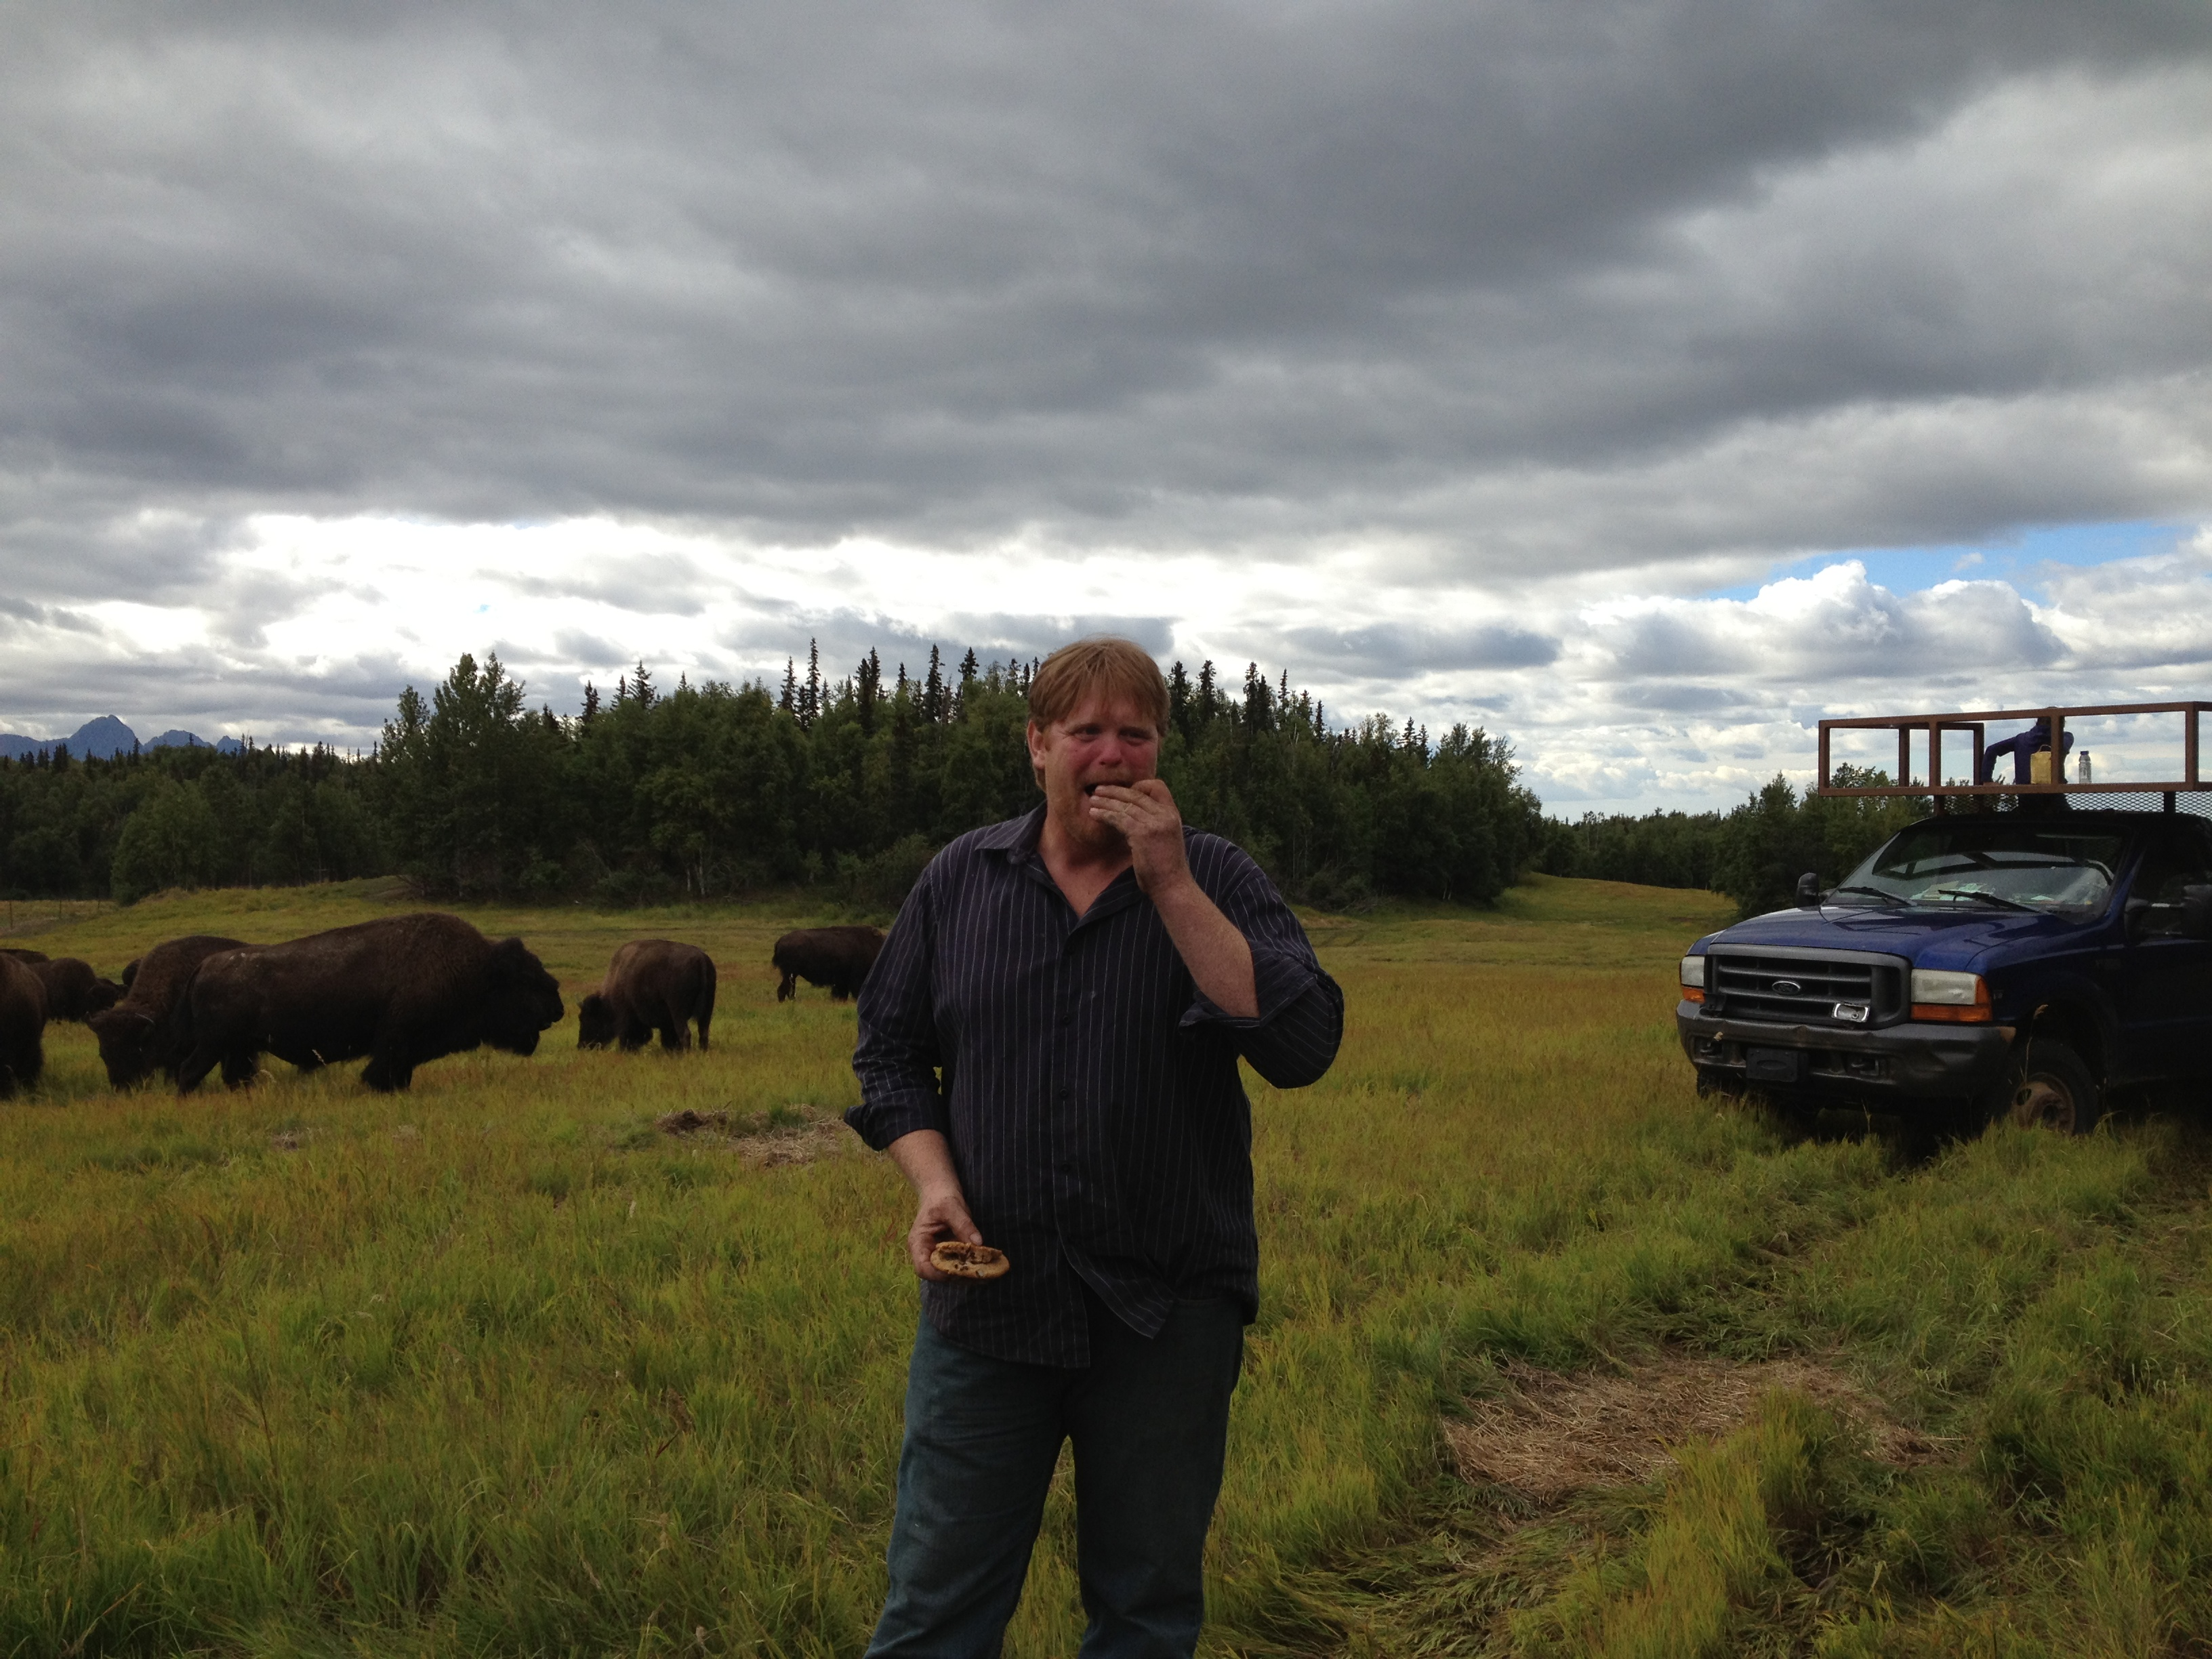 Todd Pettit and friends on Little Pitchfork Ranch (Photo by Ellen Lockyer, Alaska Public Media - Anchorage)